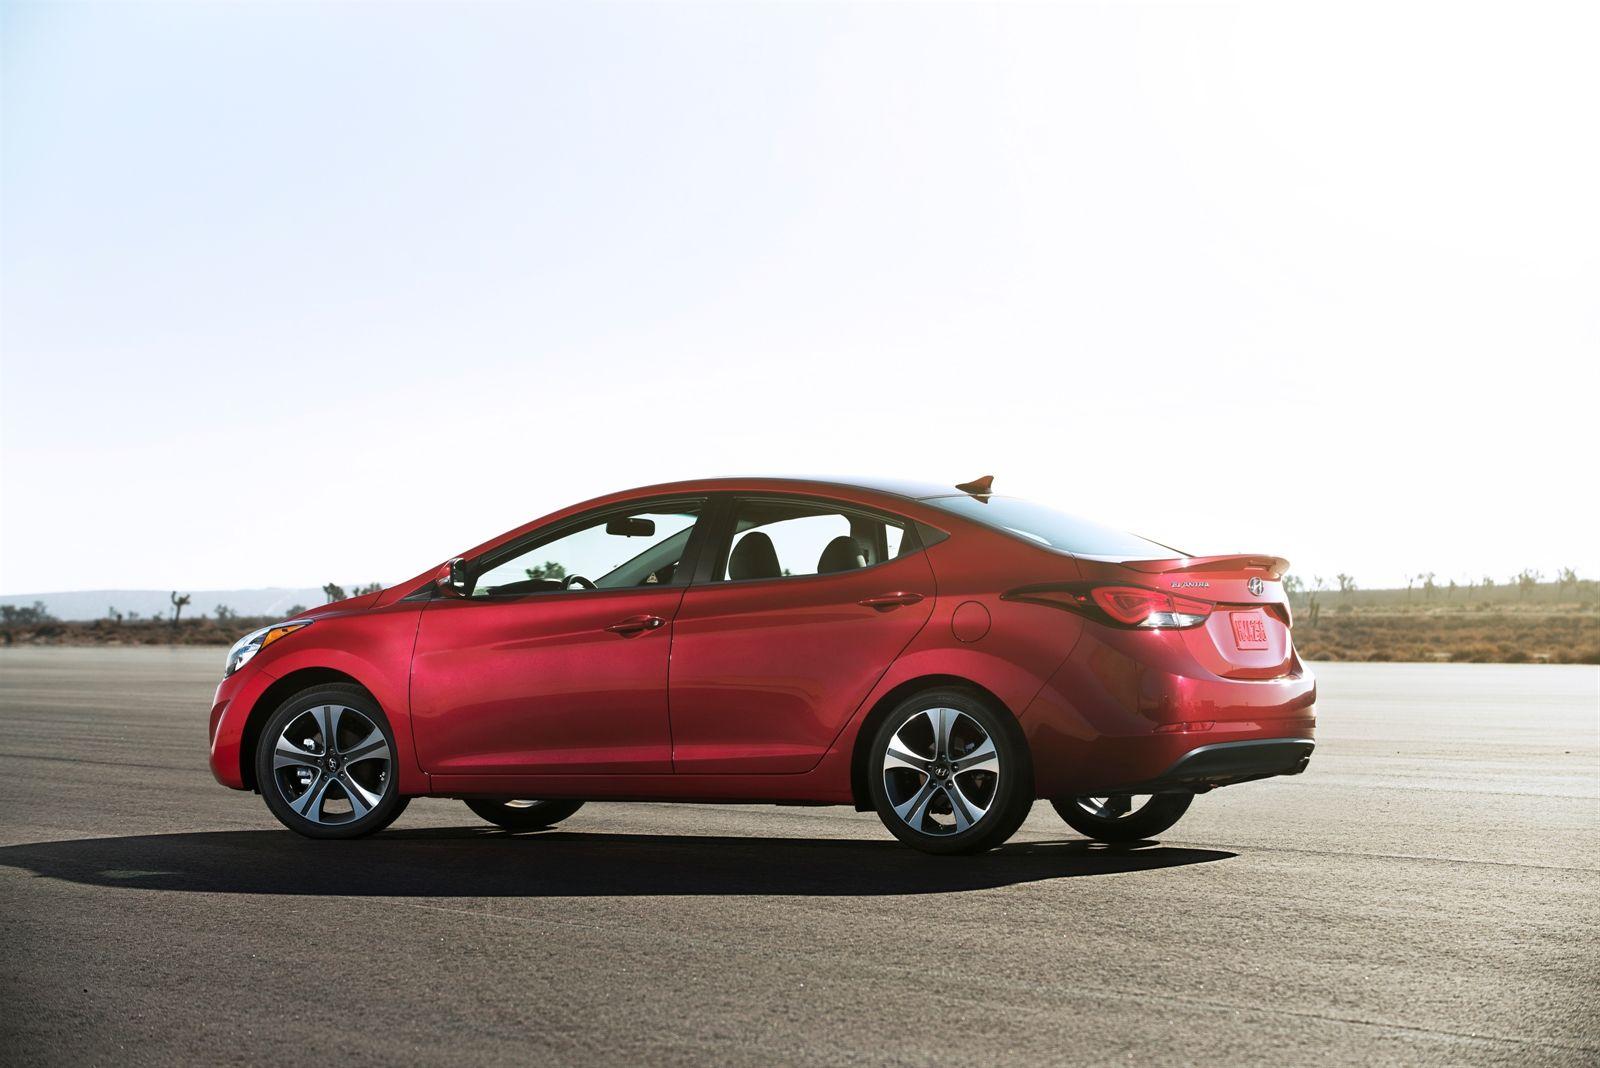 2015 hyundai sonata pricing options and specifications cleanmpg - 2014 Hyundai Elantra Sport Alloy Rims 2014 Hyundai Elantra Sedan Pinterest